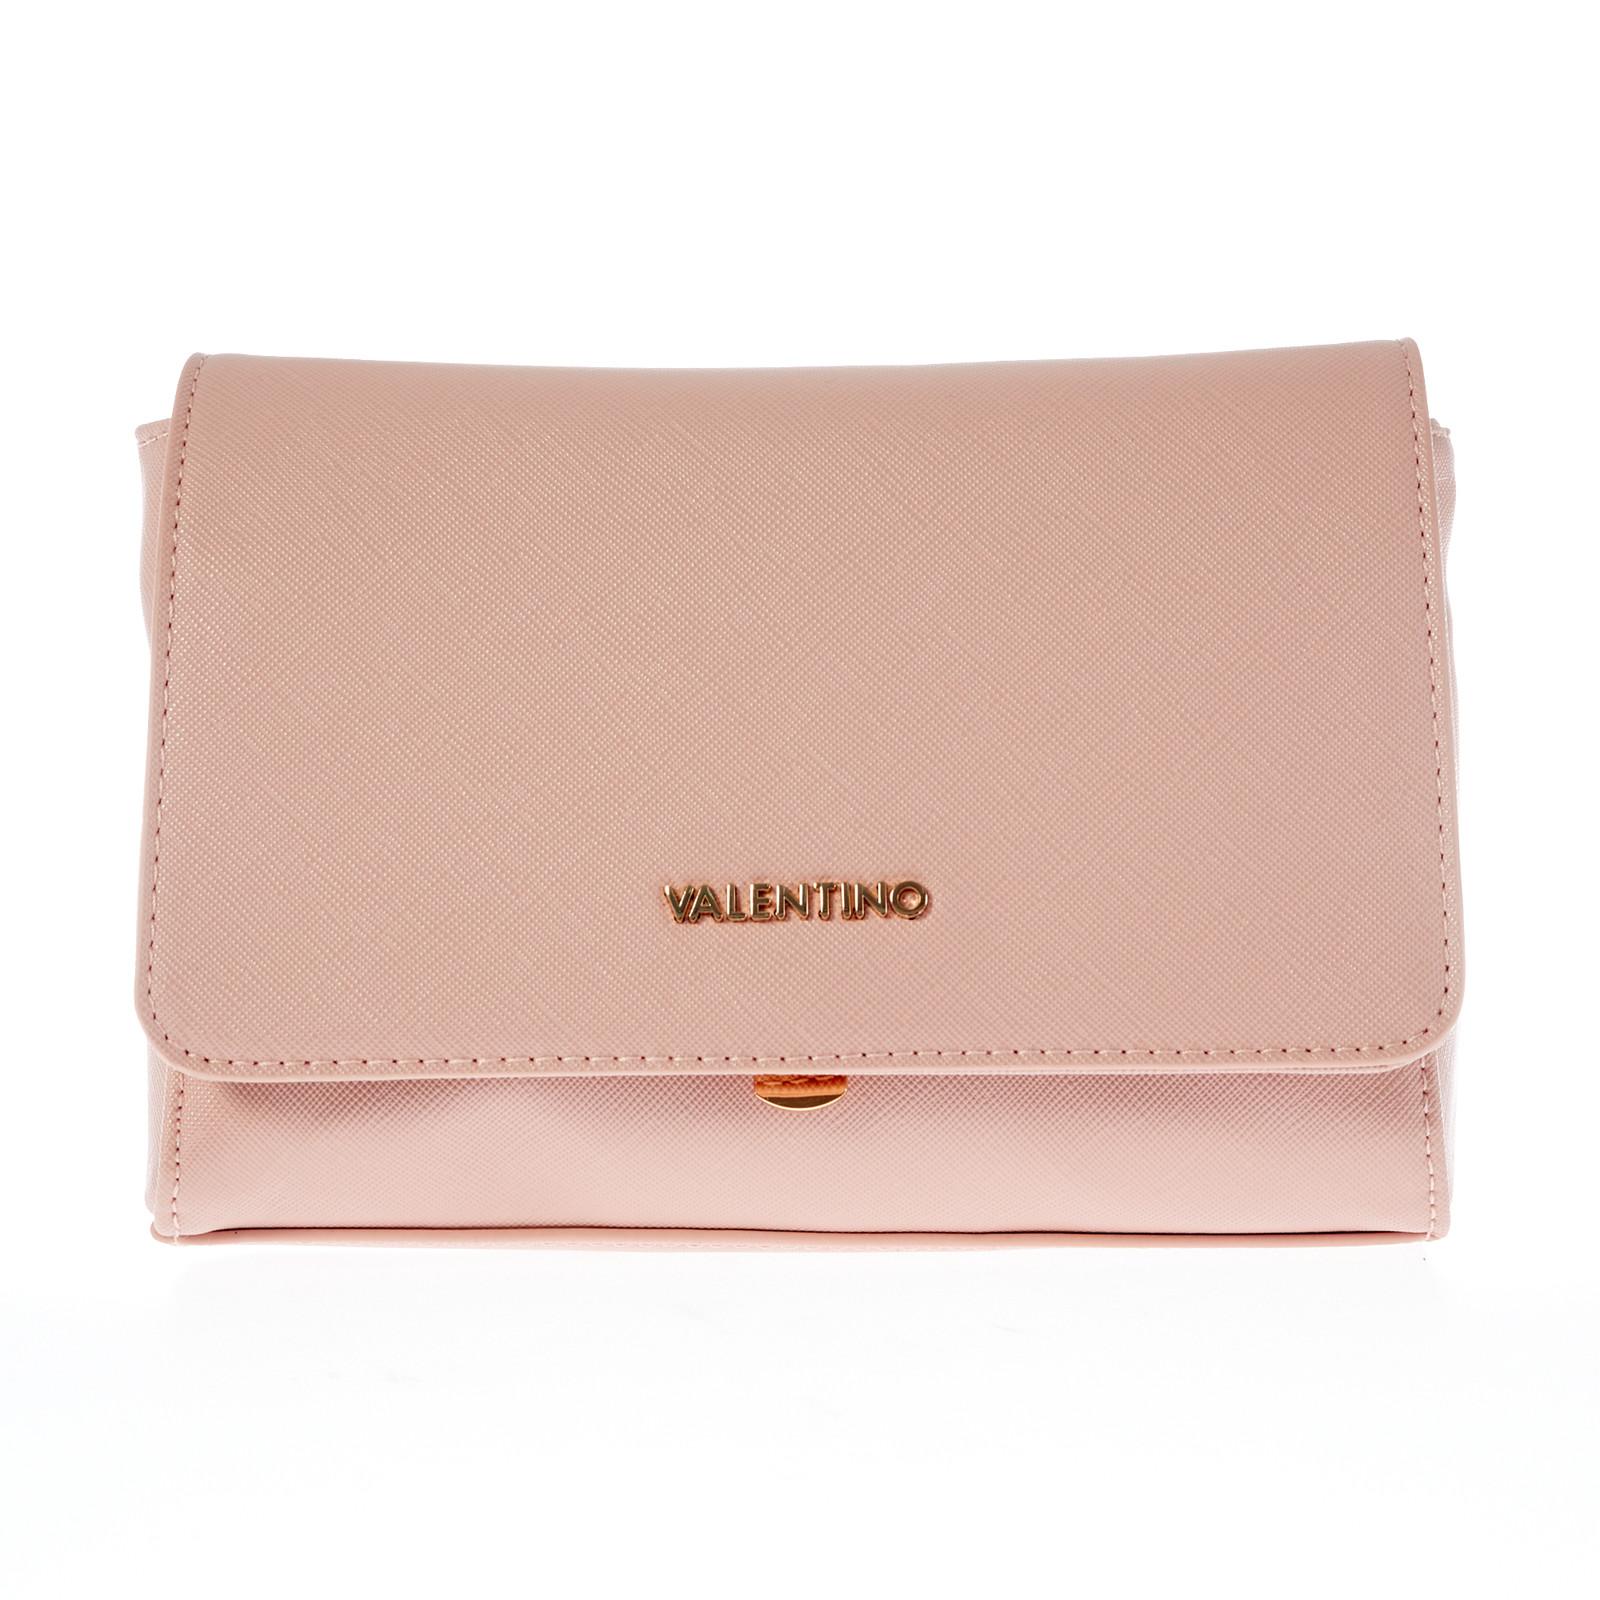 354ead5eccf Koda lille taske med klap fra Mario Valentino